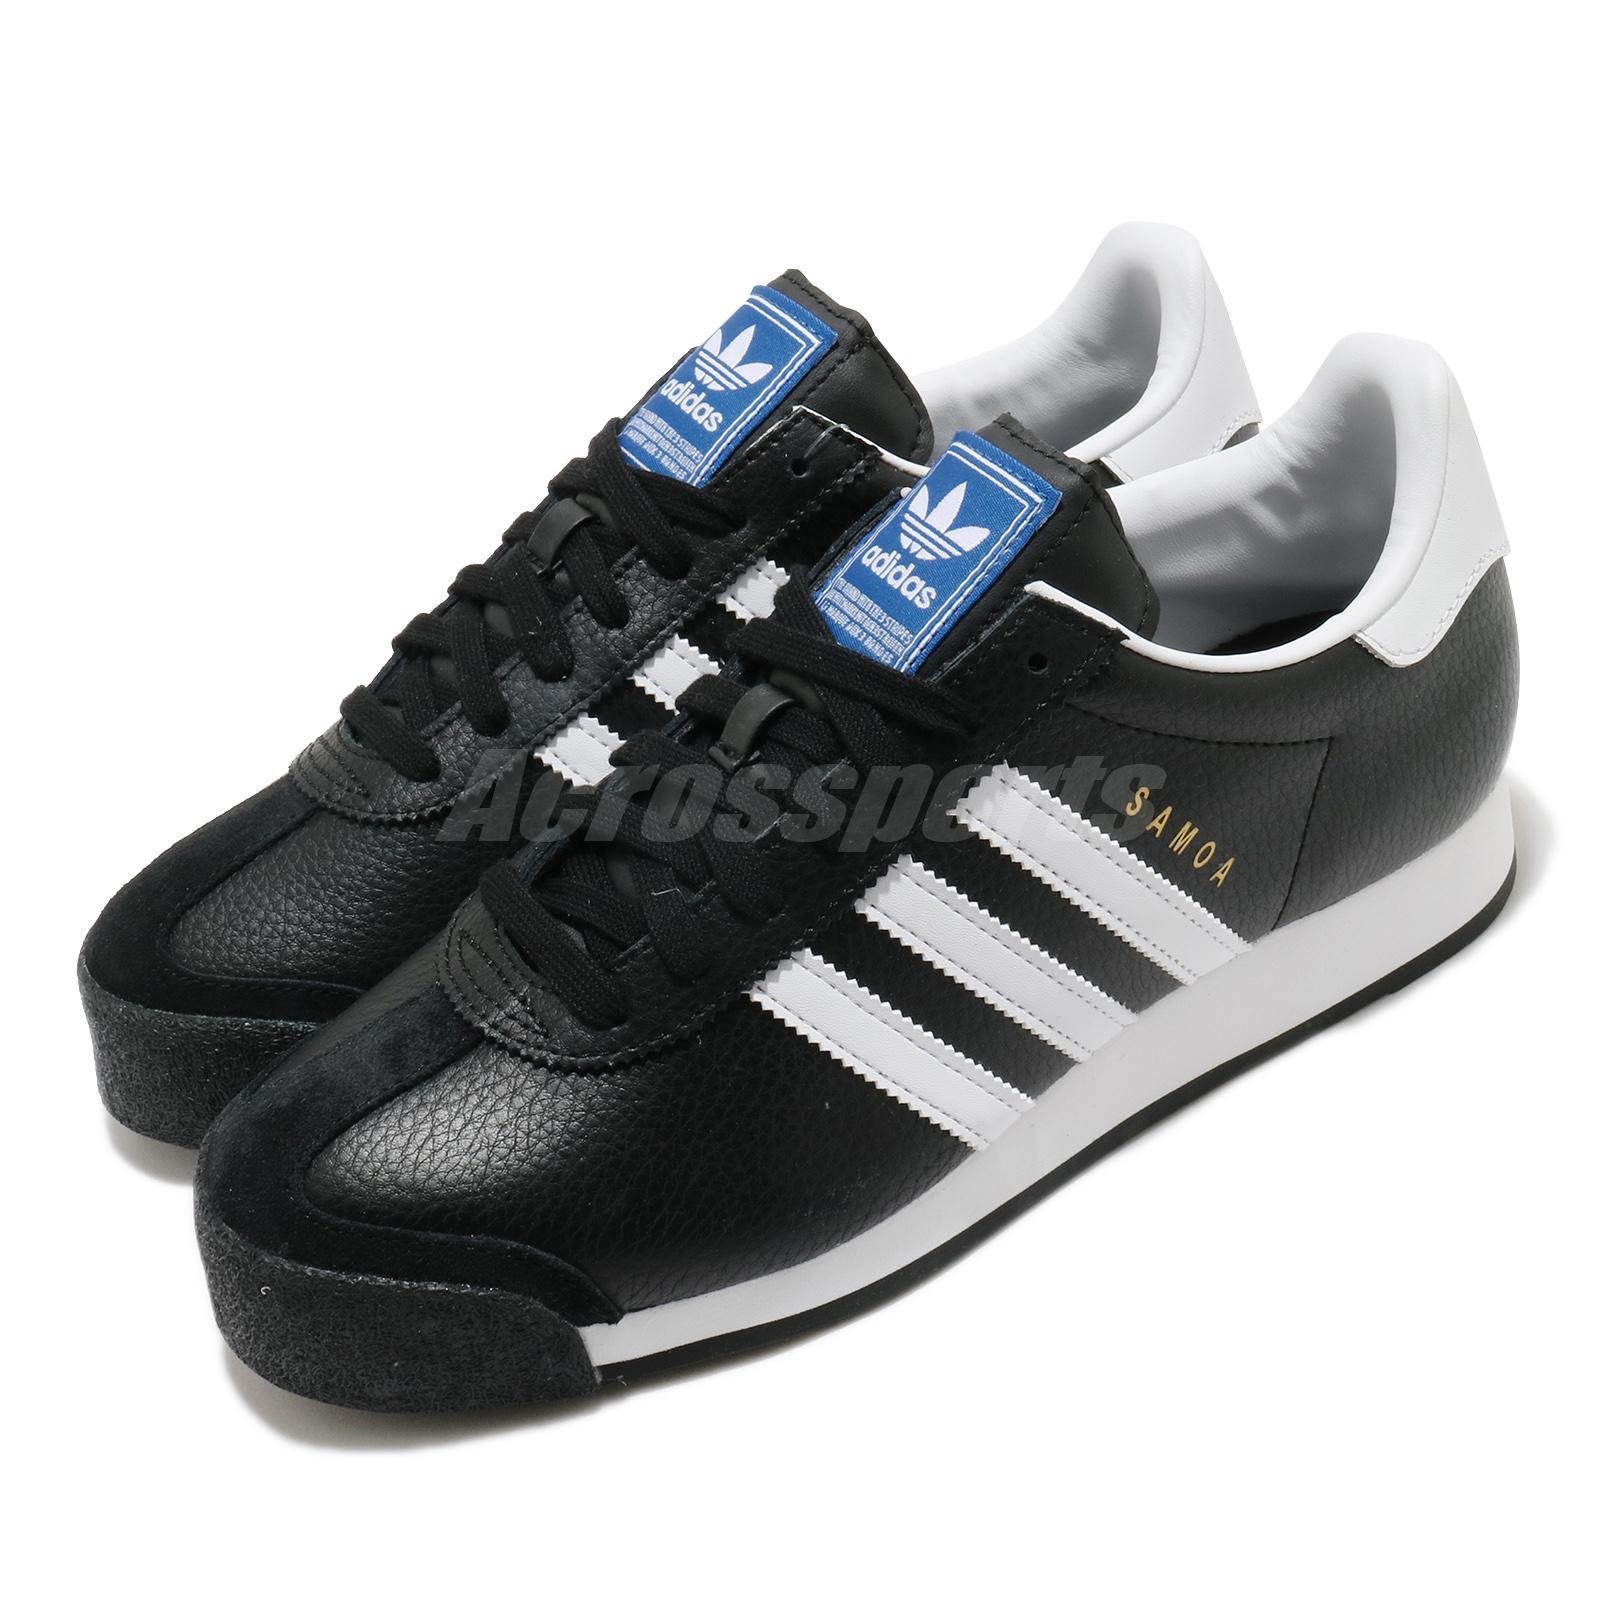 Materialismo Suave Alboroto  Adidas Originals Samoa Oro Blanco Negro Hombre Mujer Unisex Casuales  Zapatos 019351 | eBay